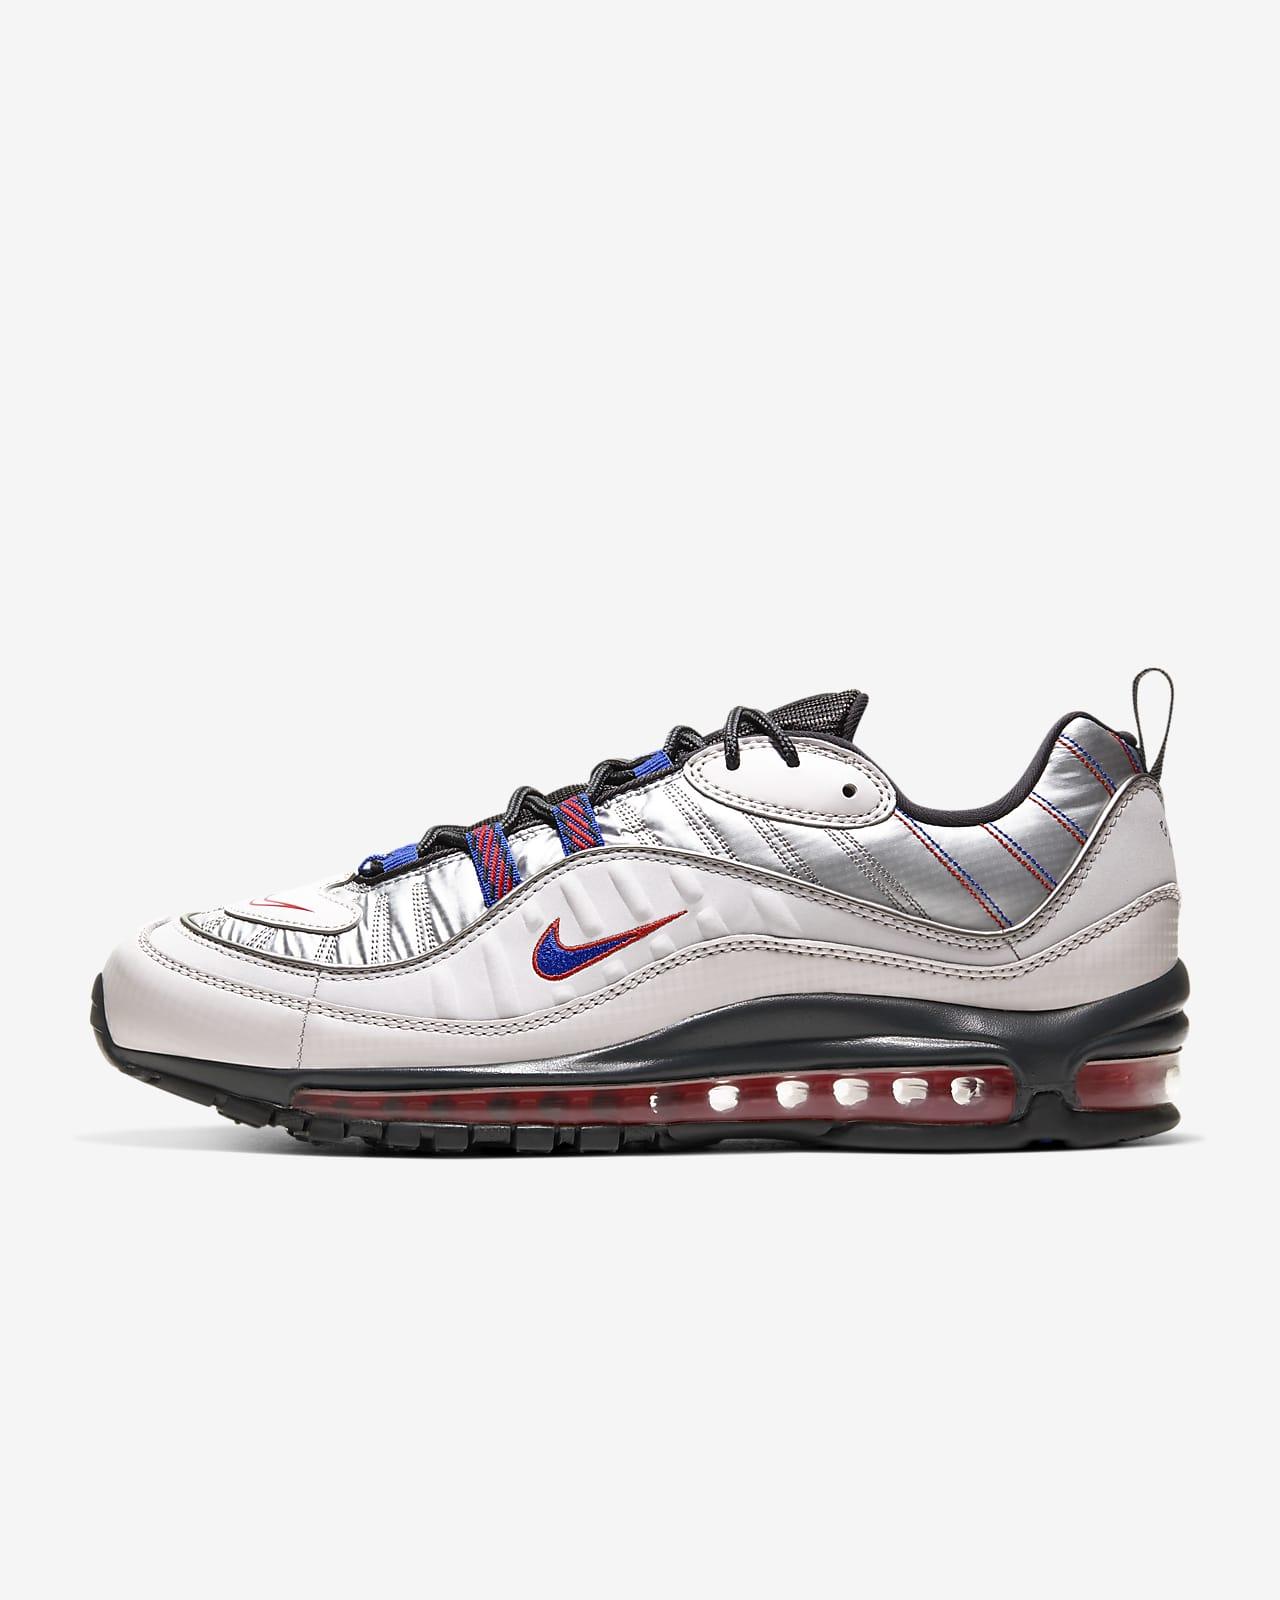 Nike Air Max 98 NRG Men's Shoe. Nike SG